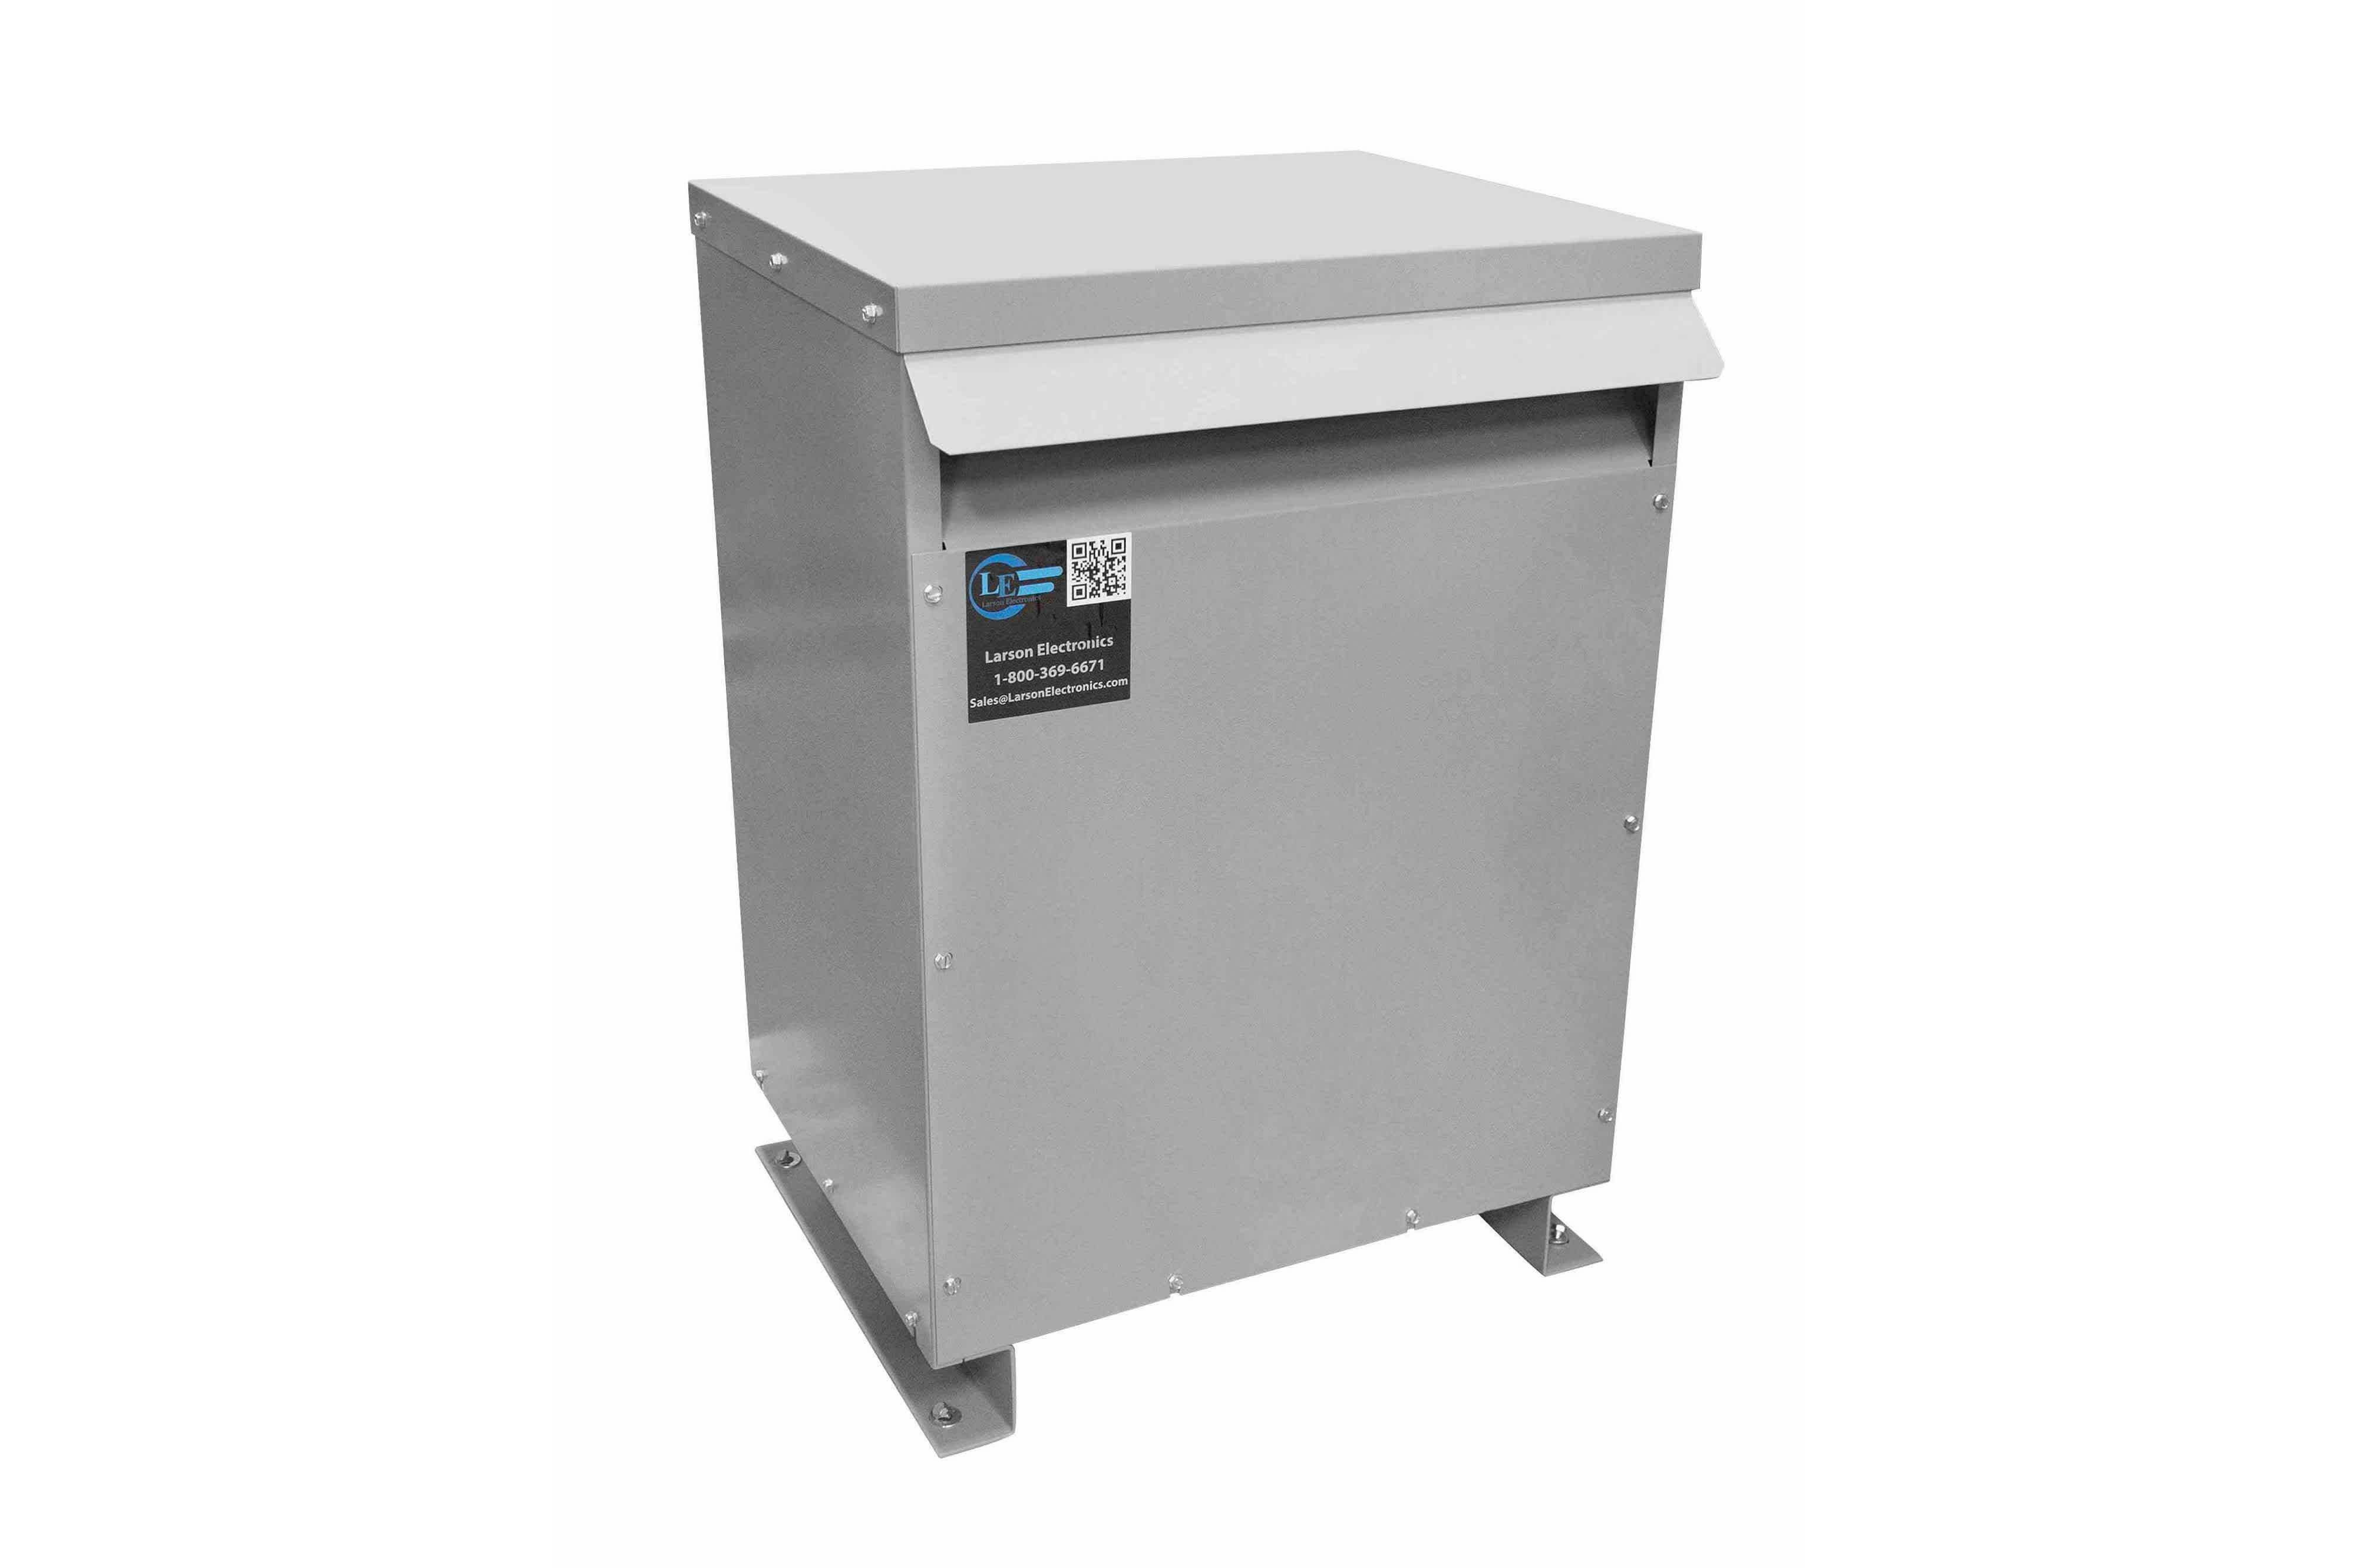 275 kVA 3PH Isolation Transformer, 600V Wye Primary, 415V Delta Secondary, N3R, Ventilated, 60 Hz